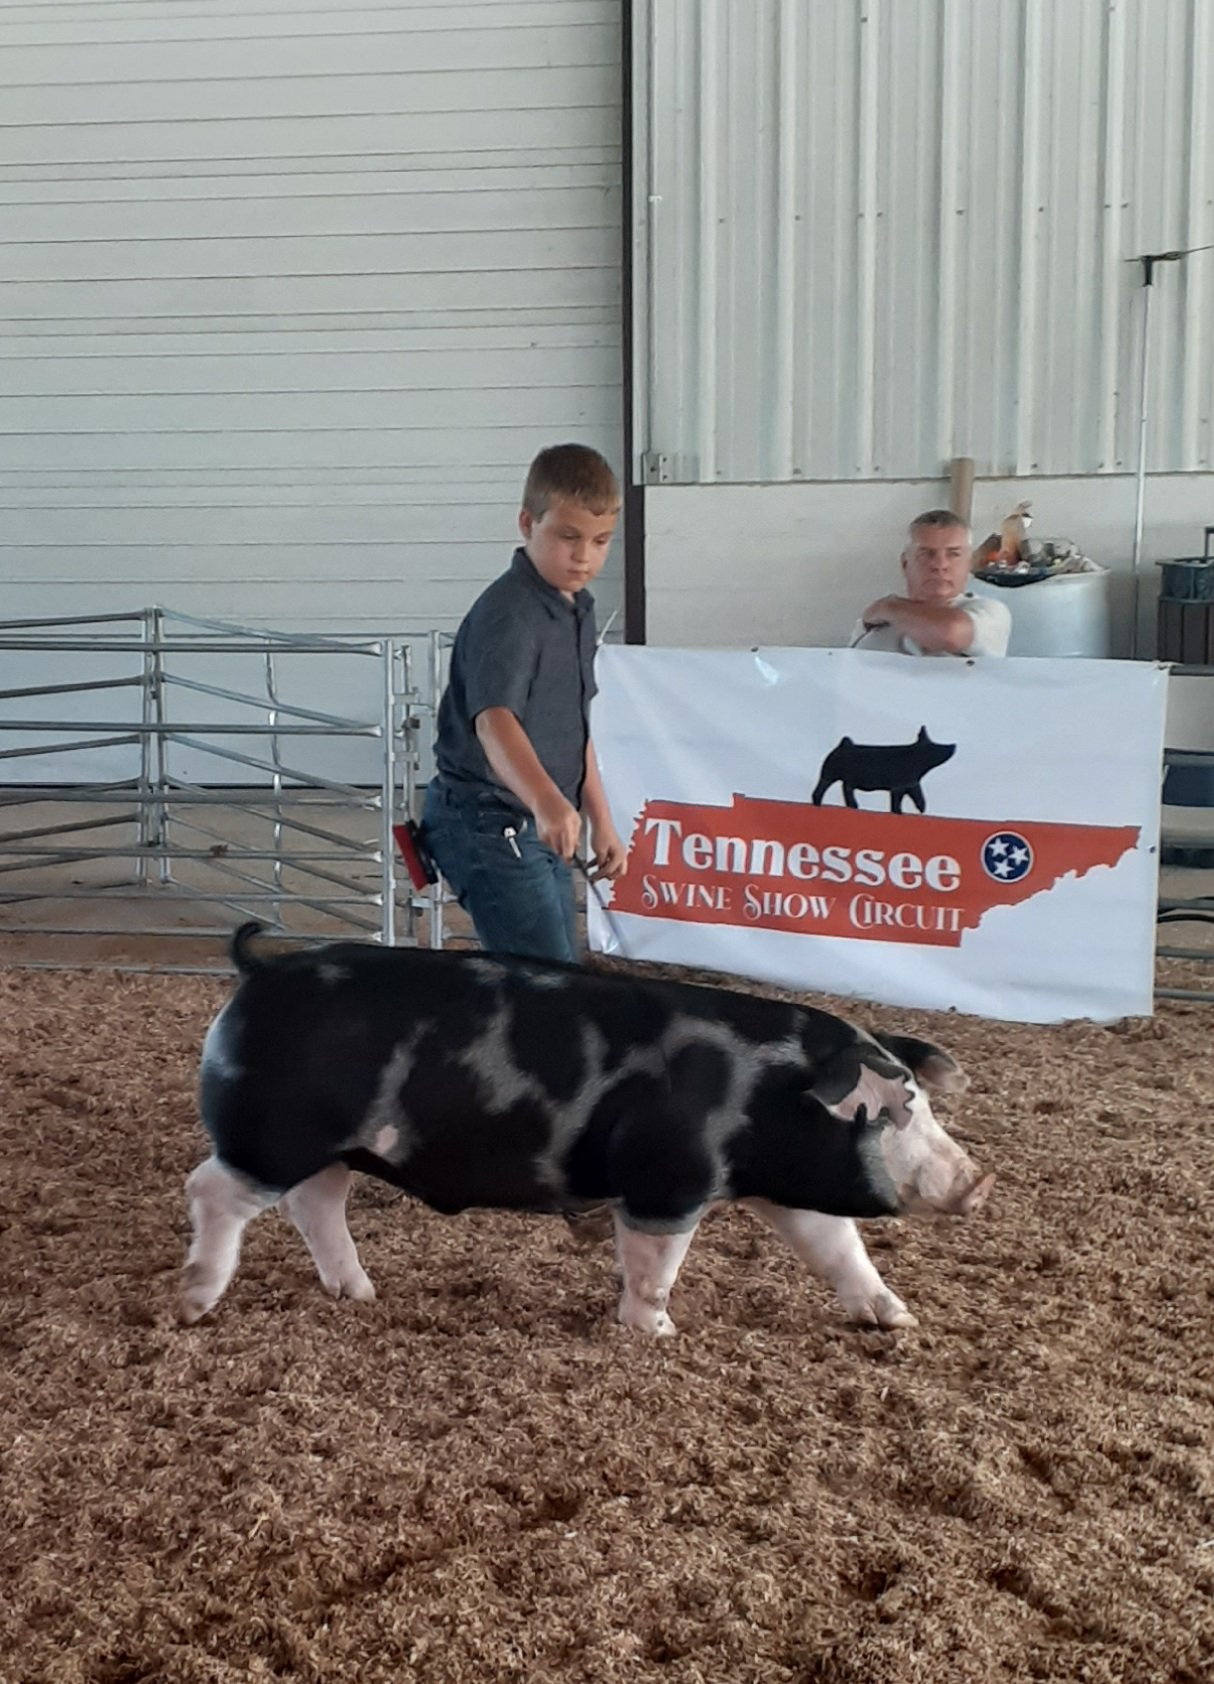 Declan Lusk Smith County Swine Shootout Champion Spot Barrow